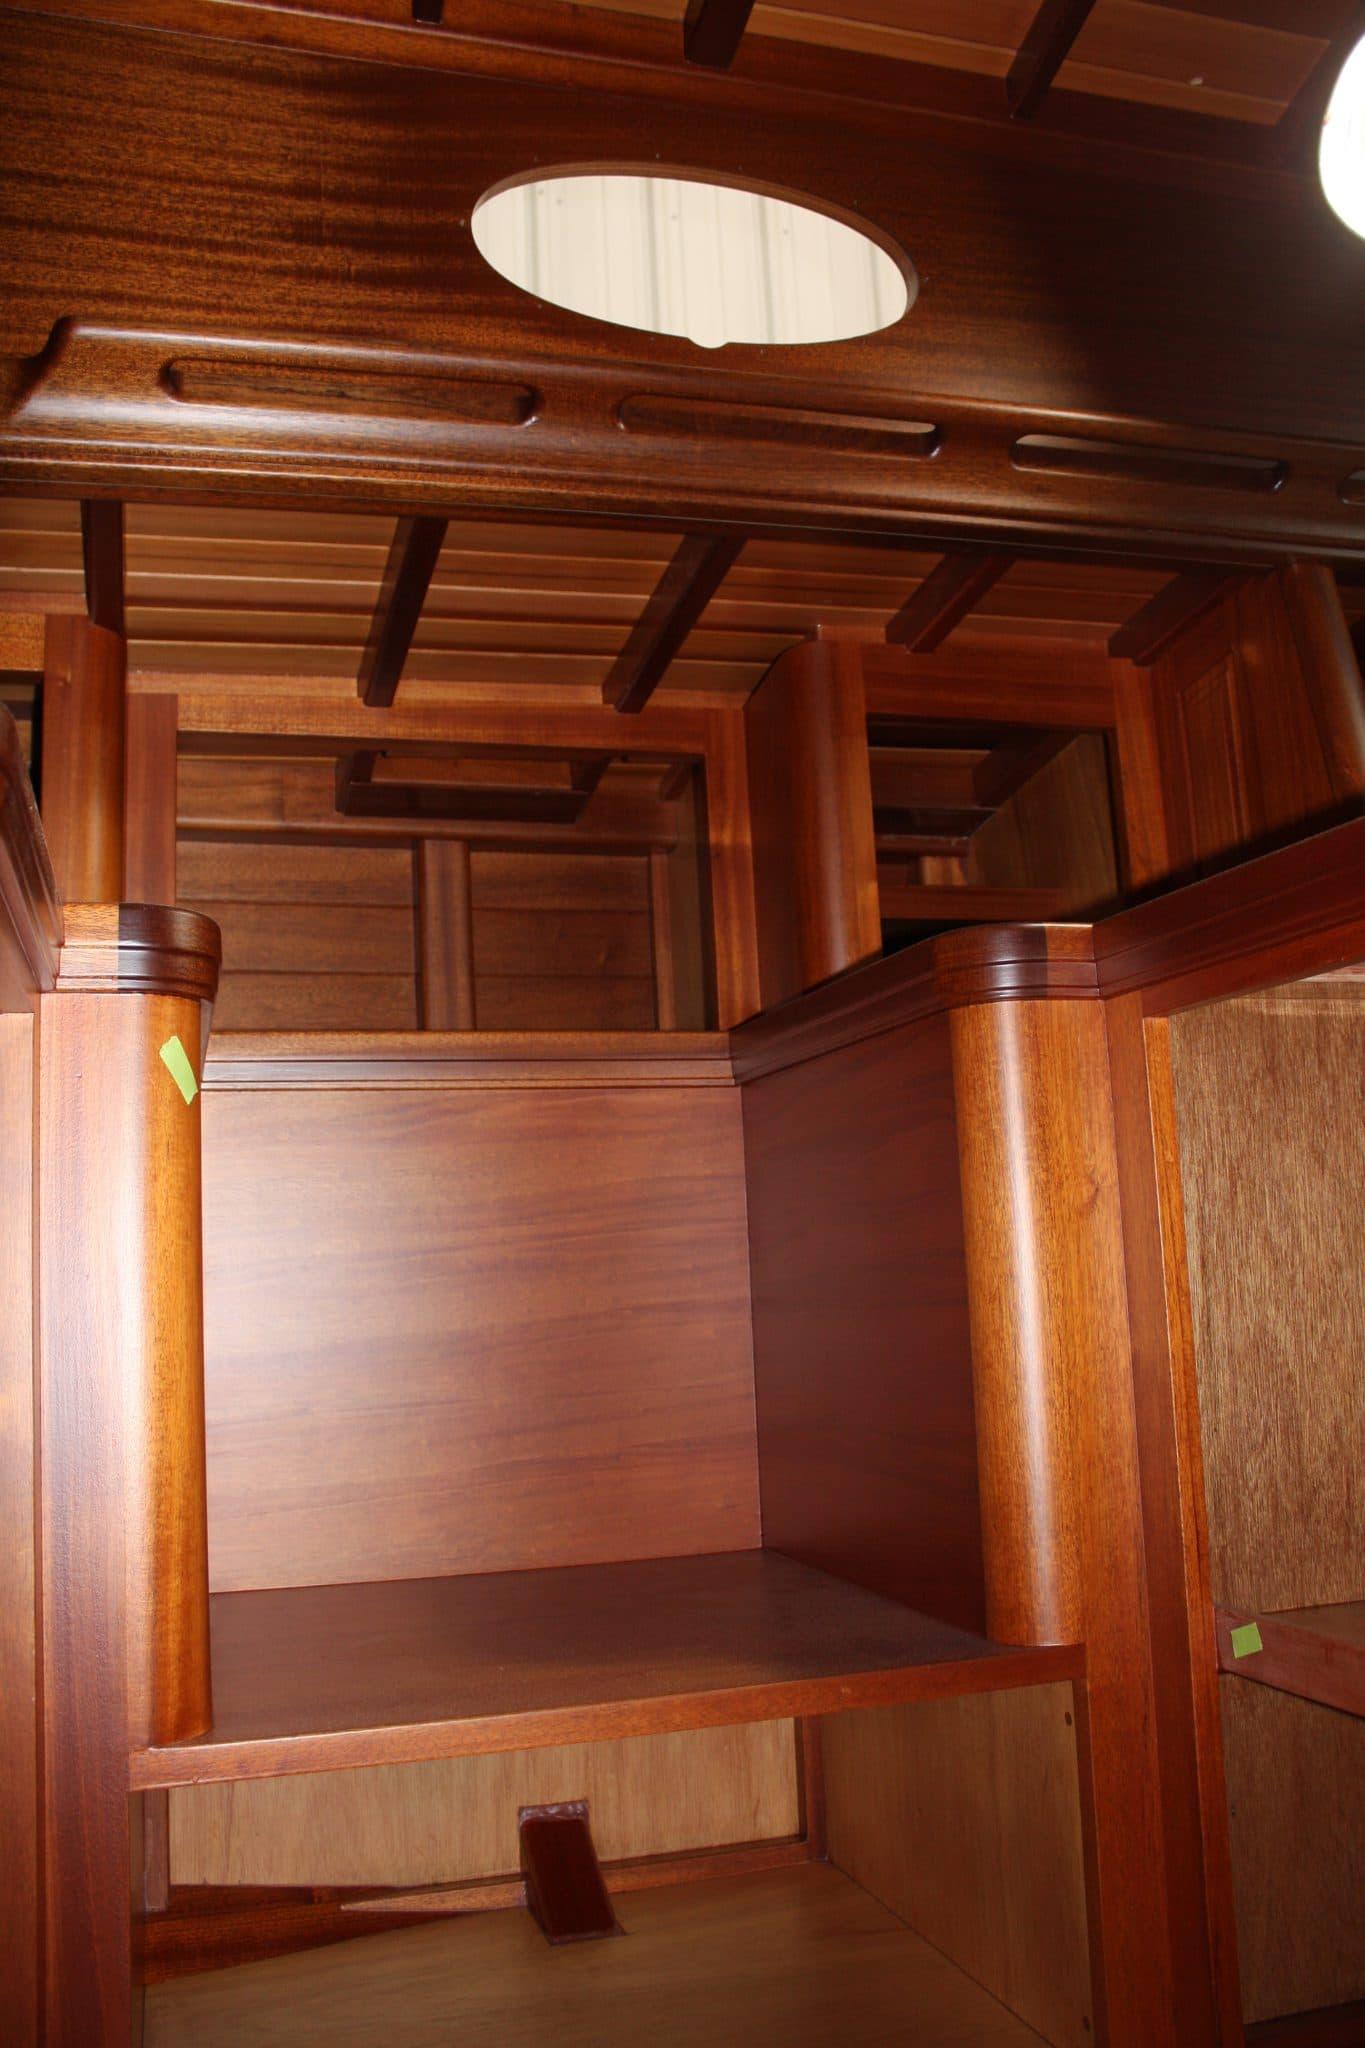 Elegant, hand crafted, mahogany interior of Italmas